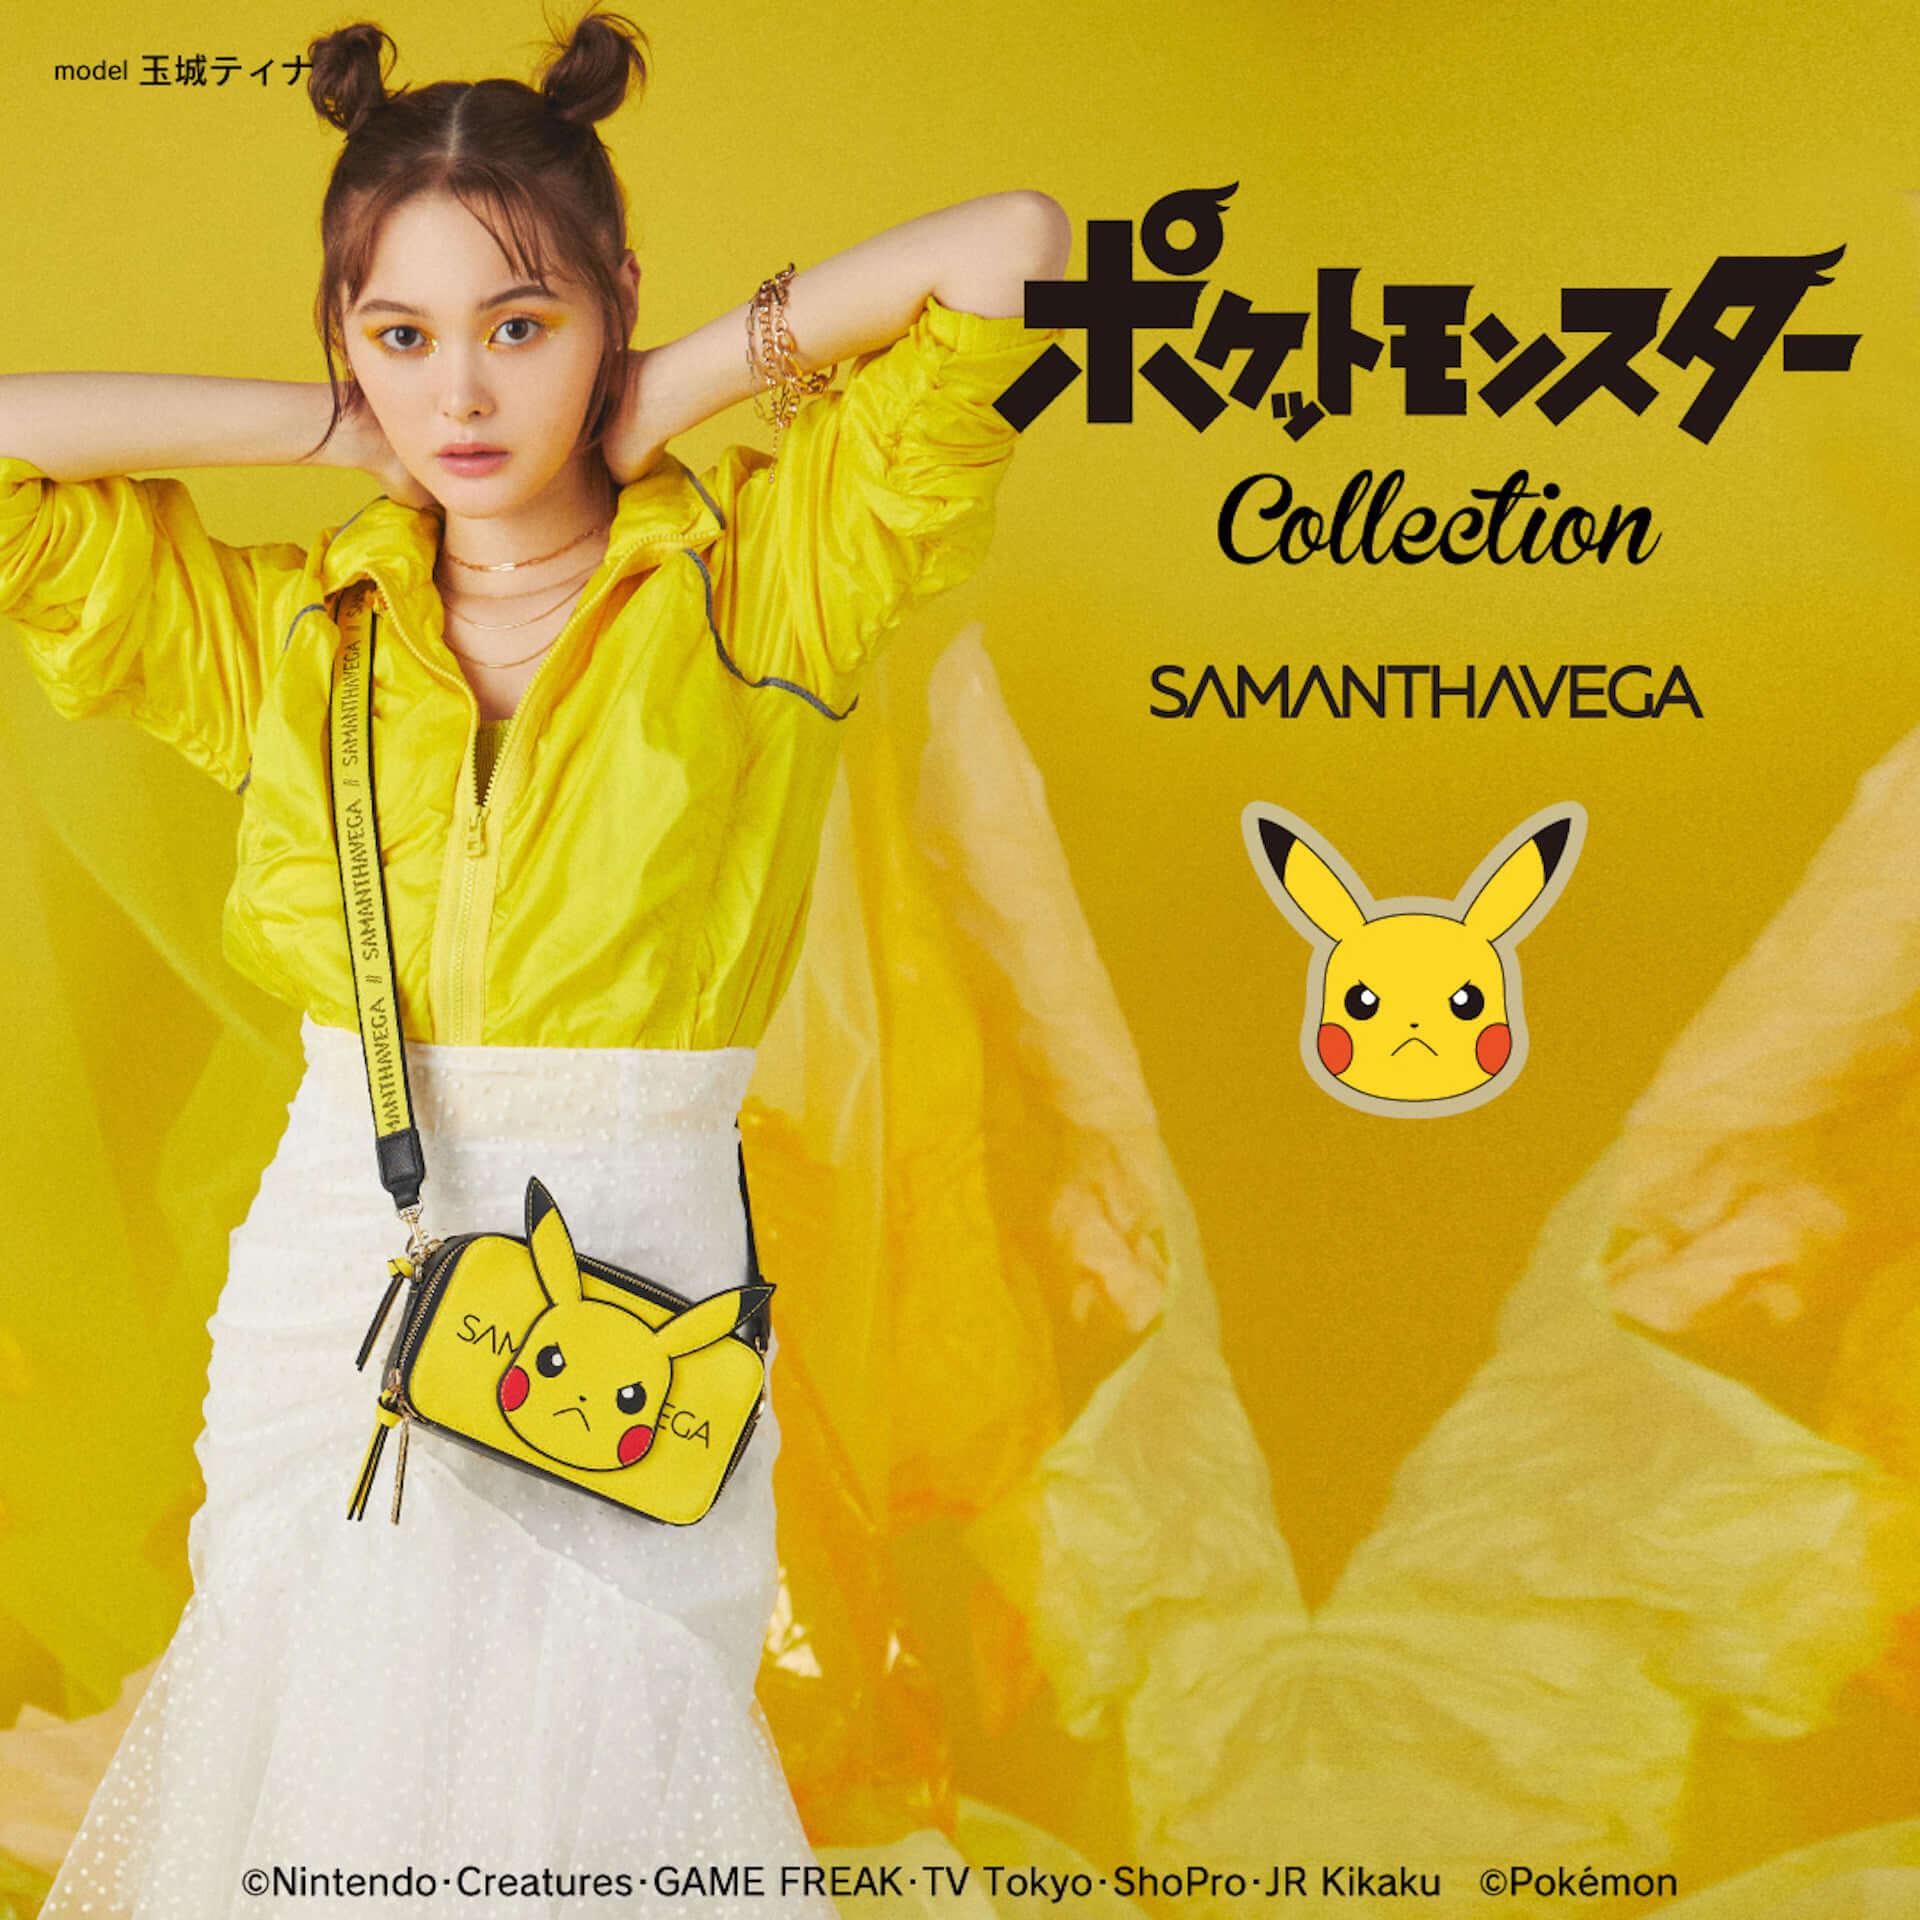 SAMANTHAVEGAにて『ポケットモンスター』とのコラボコレクションが登場!阪急うめだ本店では『ピカチュウ柄のリュック』も販売予定 lf200730_samanthavega-pokemon_1-1920x1920